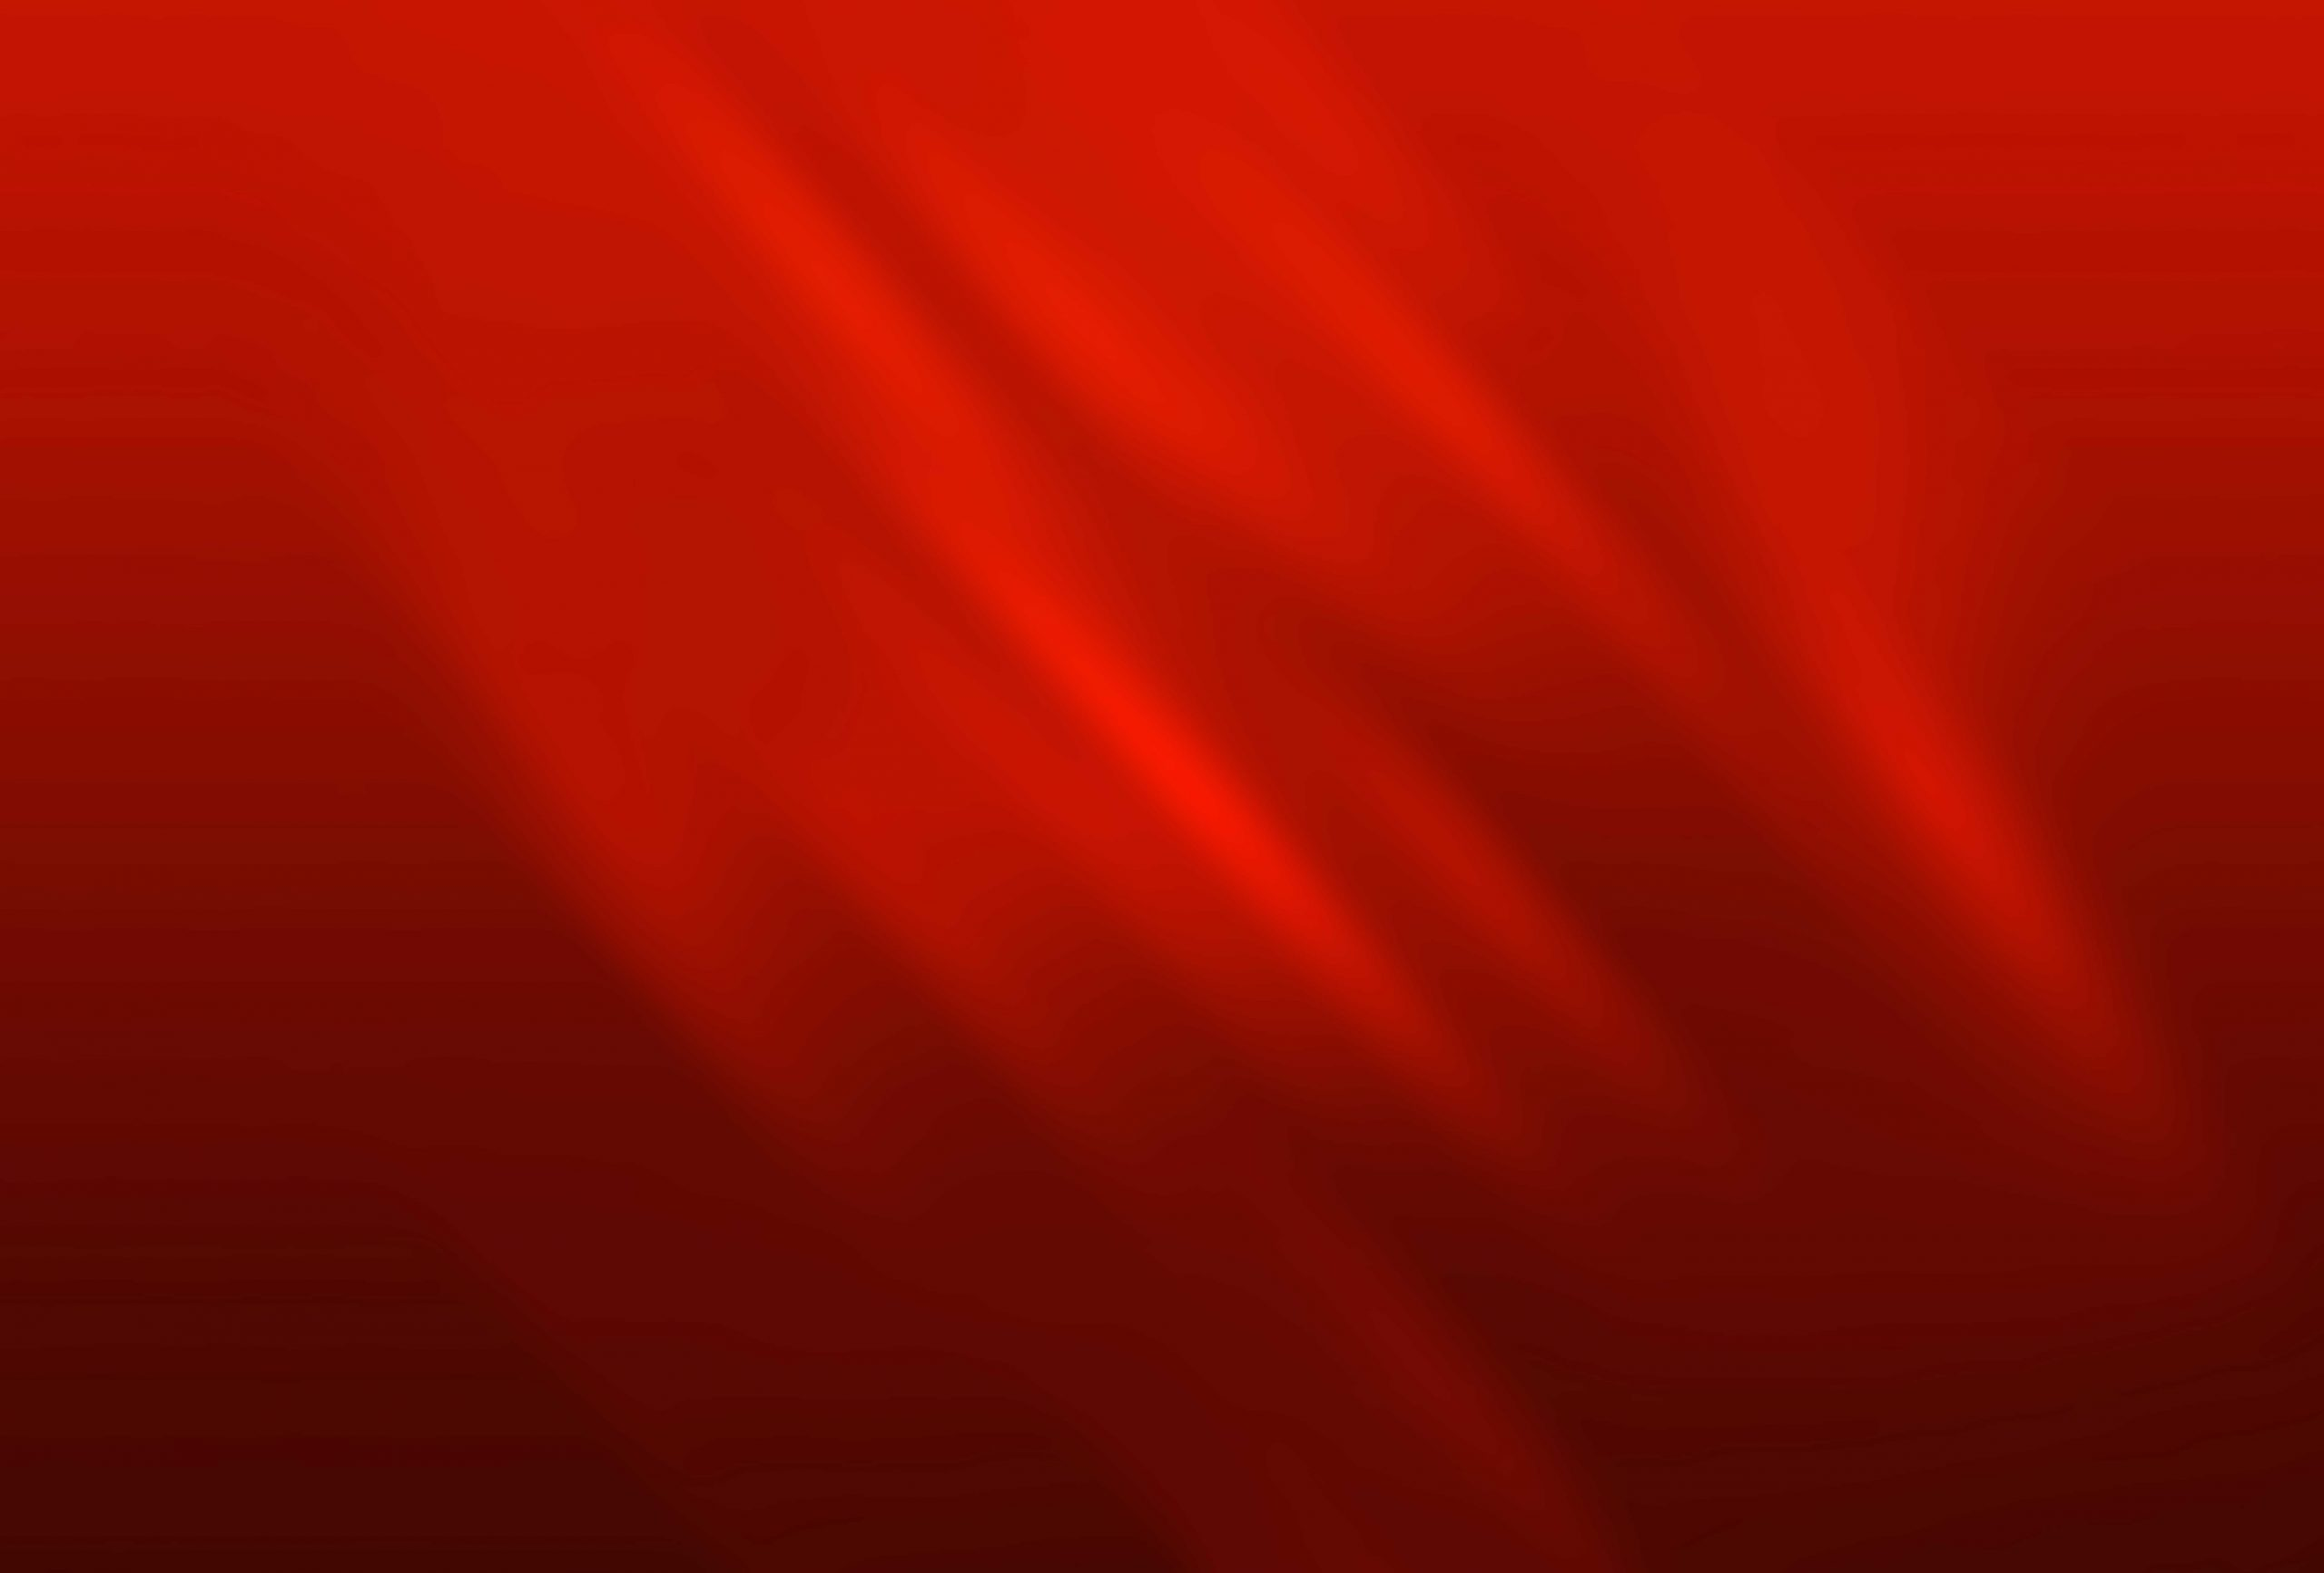 background_merah